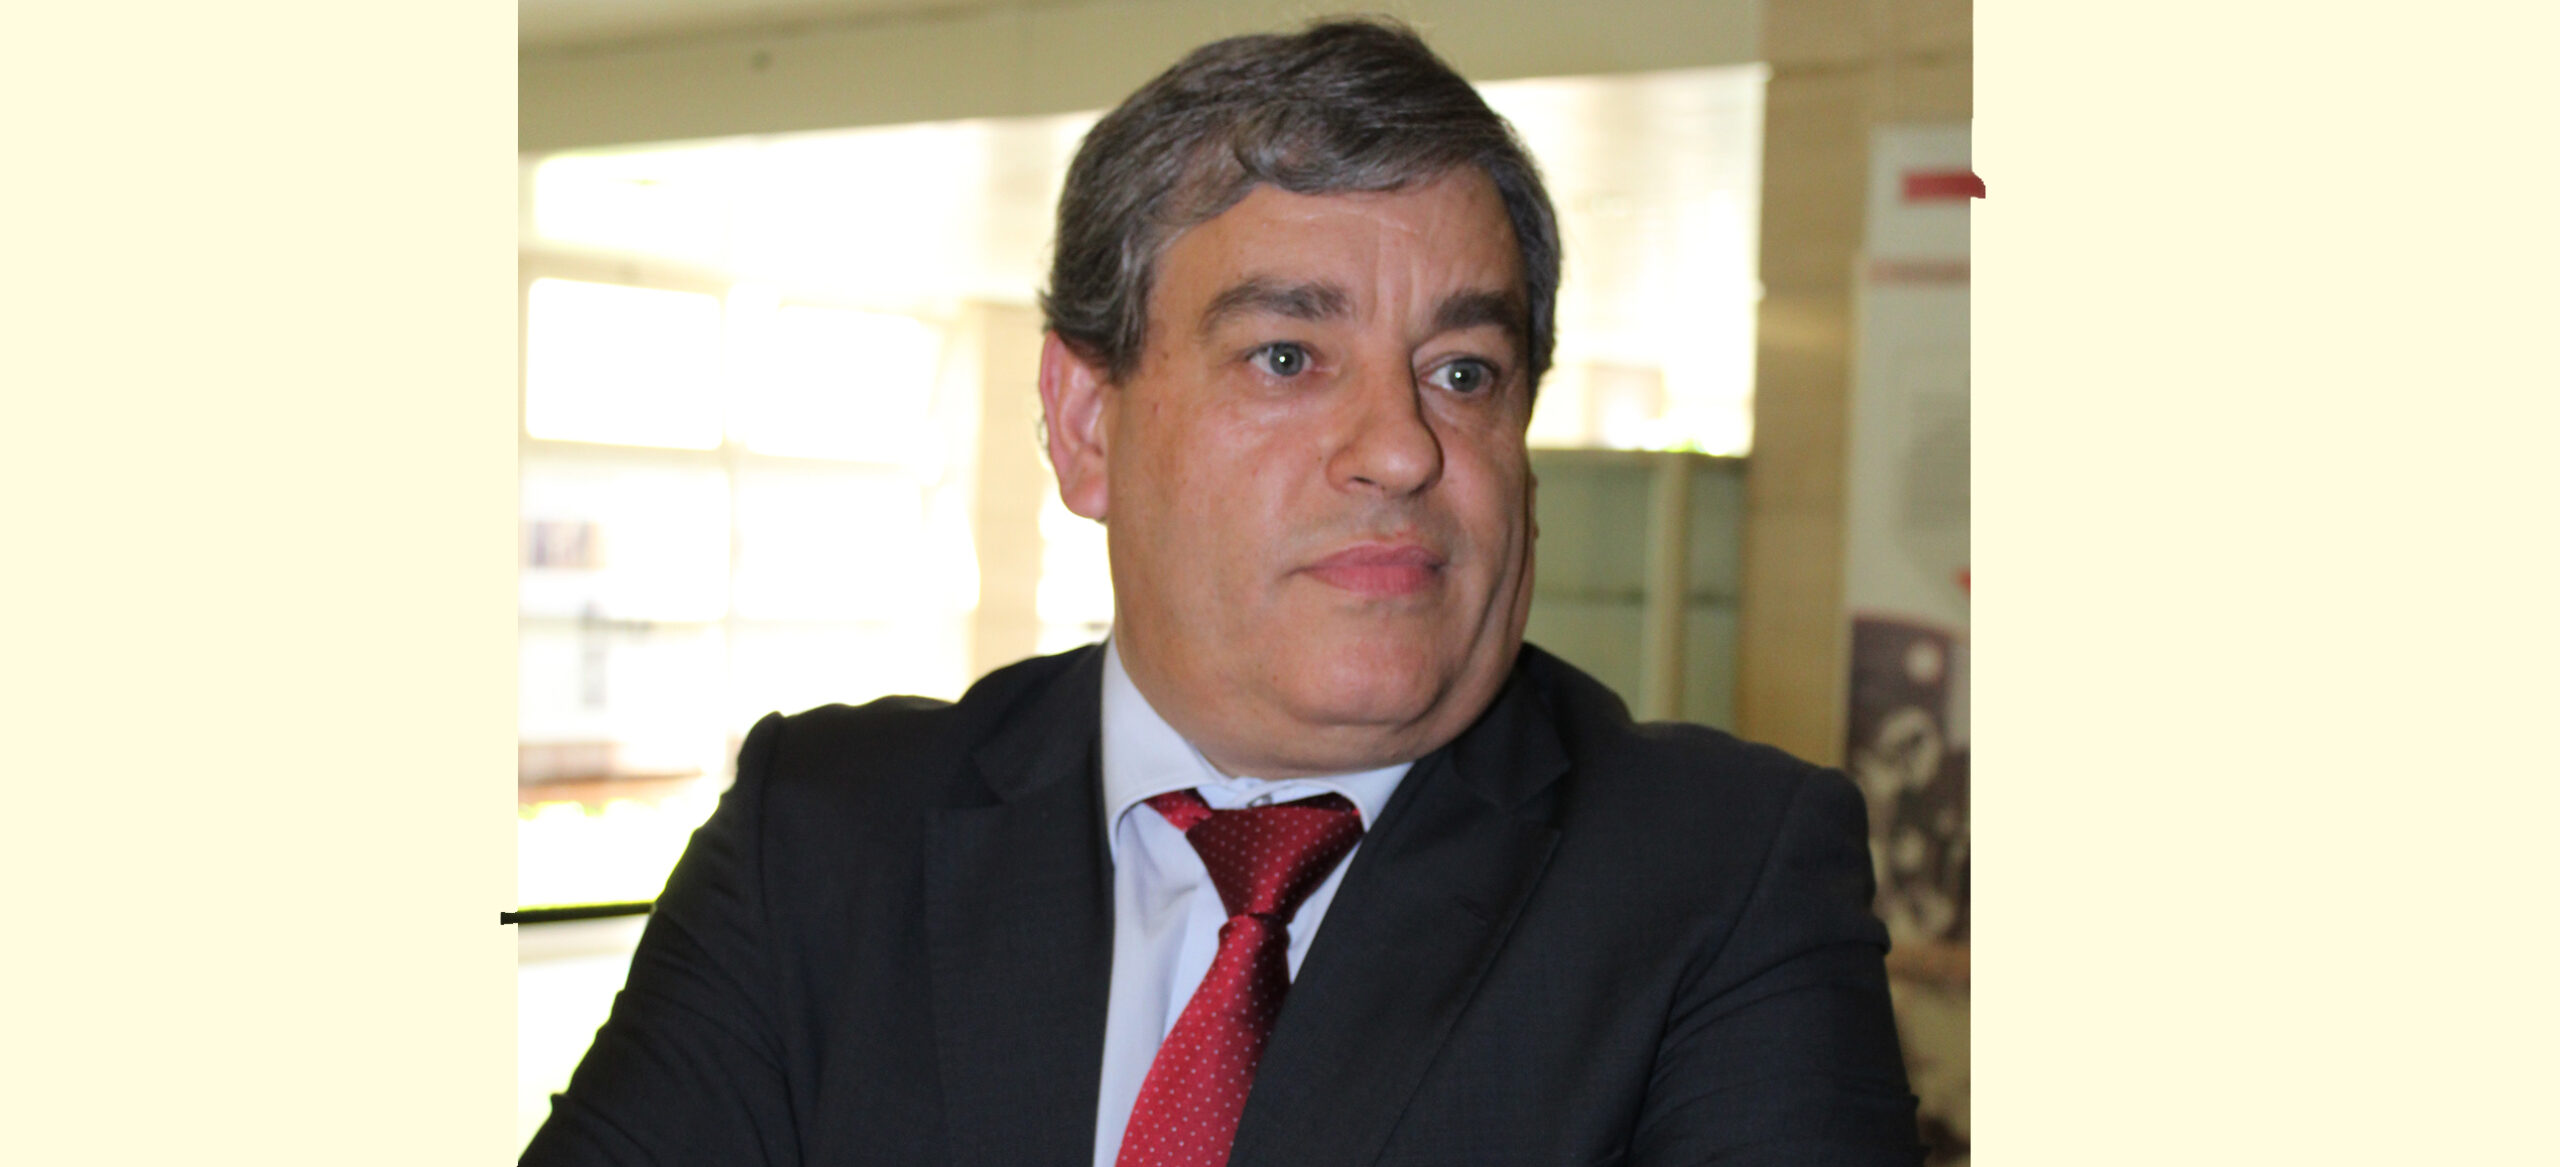 Jose ribeiro 1 scaled